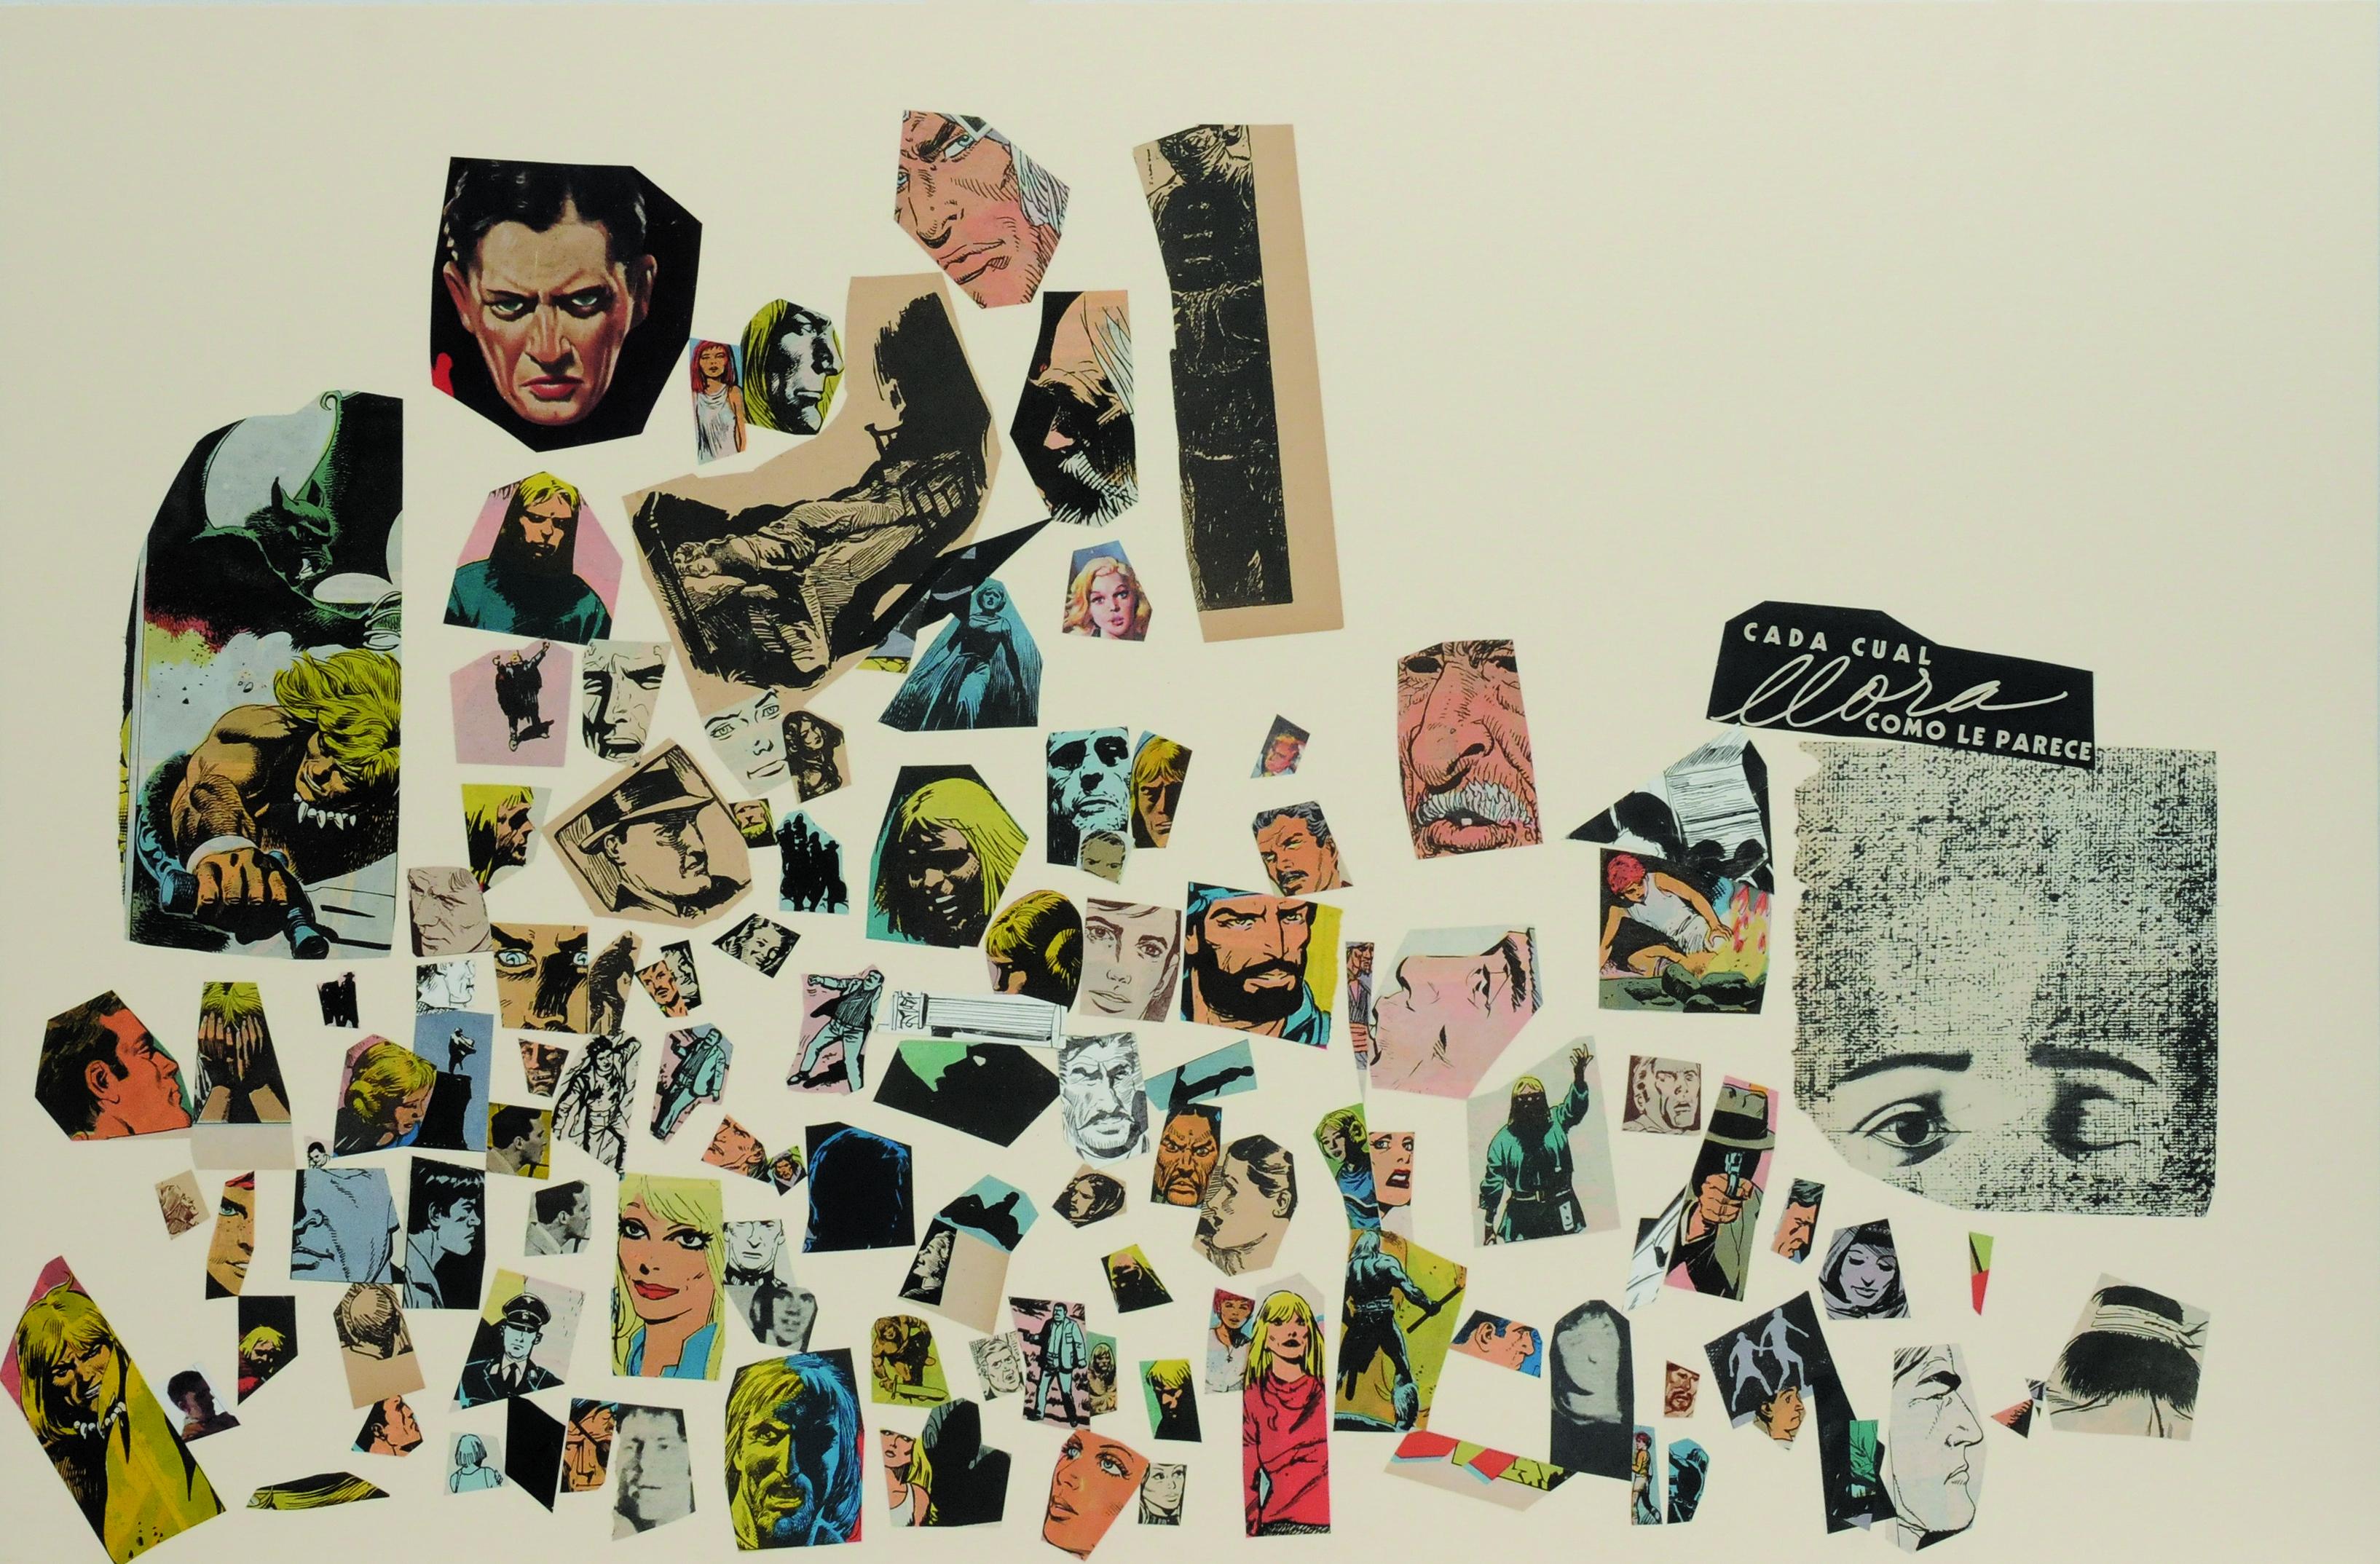 Cada cual llora como le parece, papel collage, 51 cm x 76 cm. 2008